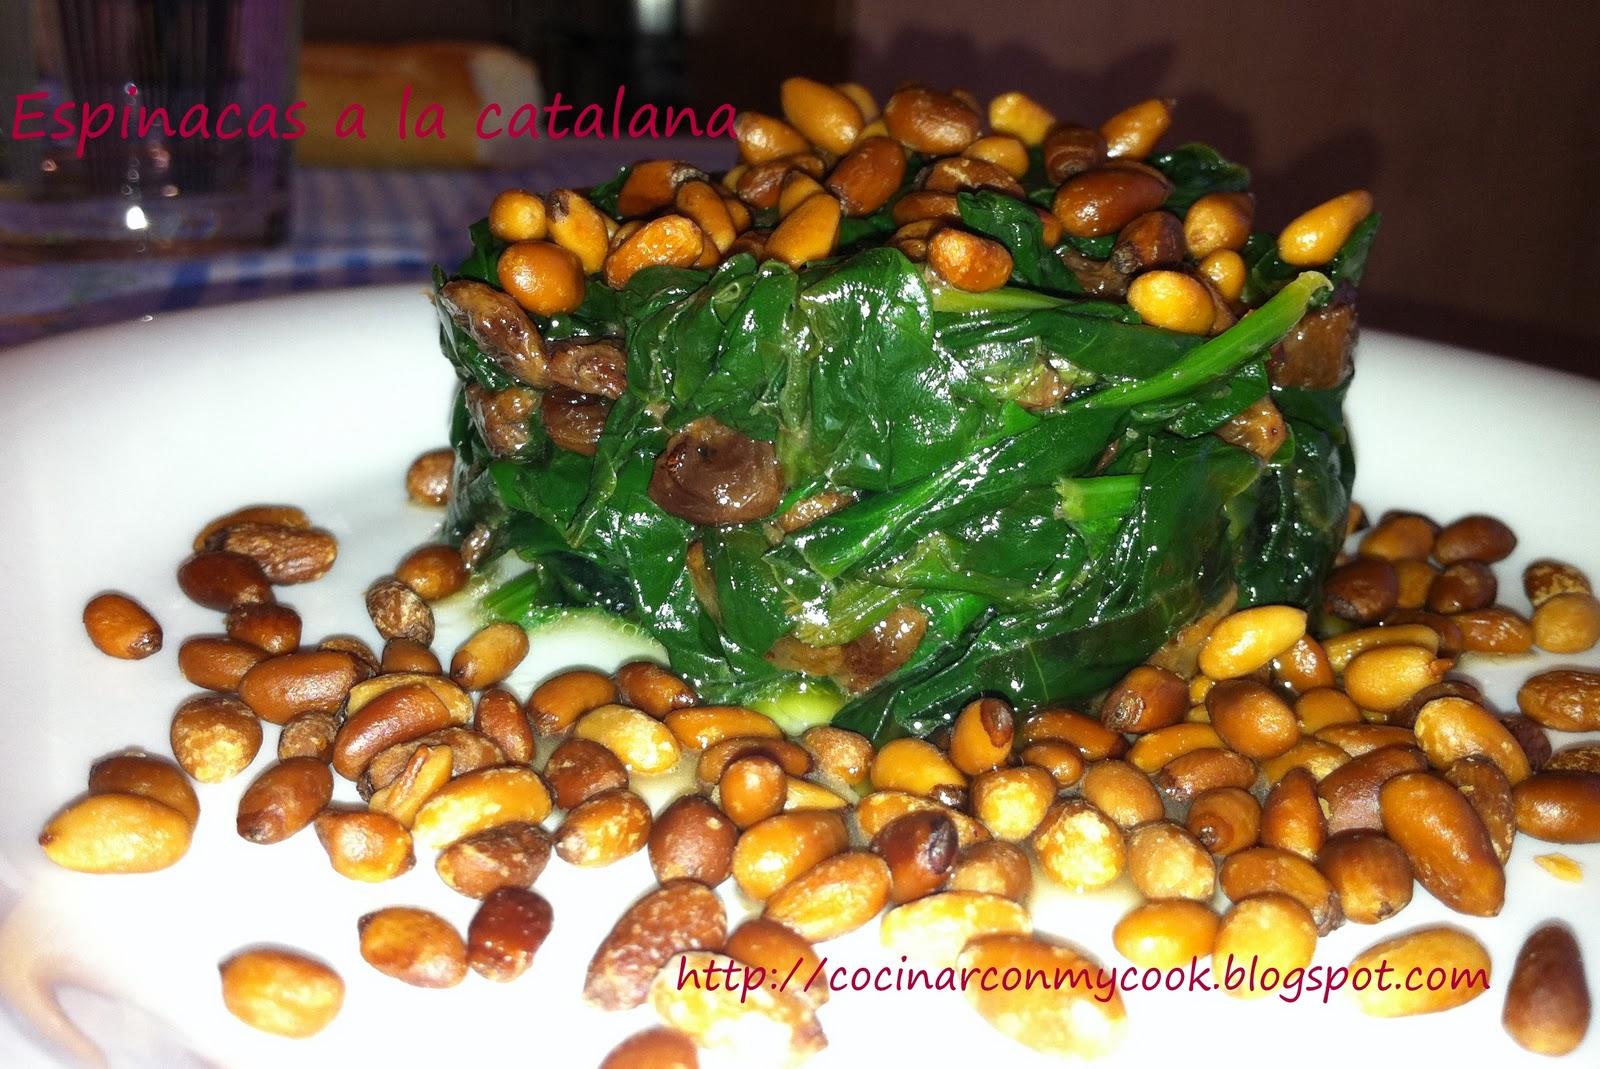 Cocinar con mycook espinacas a la catalana for Cocinar espinacas